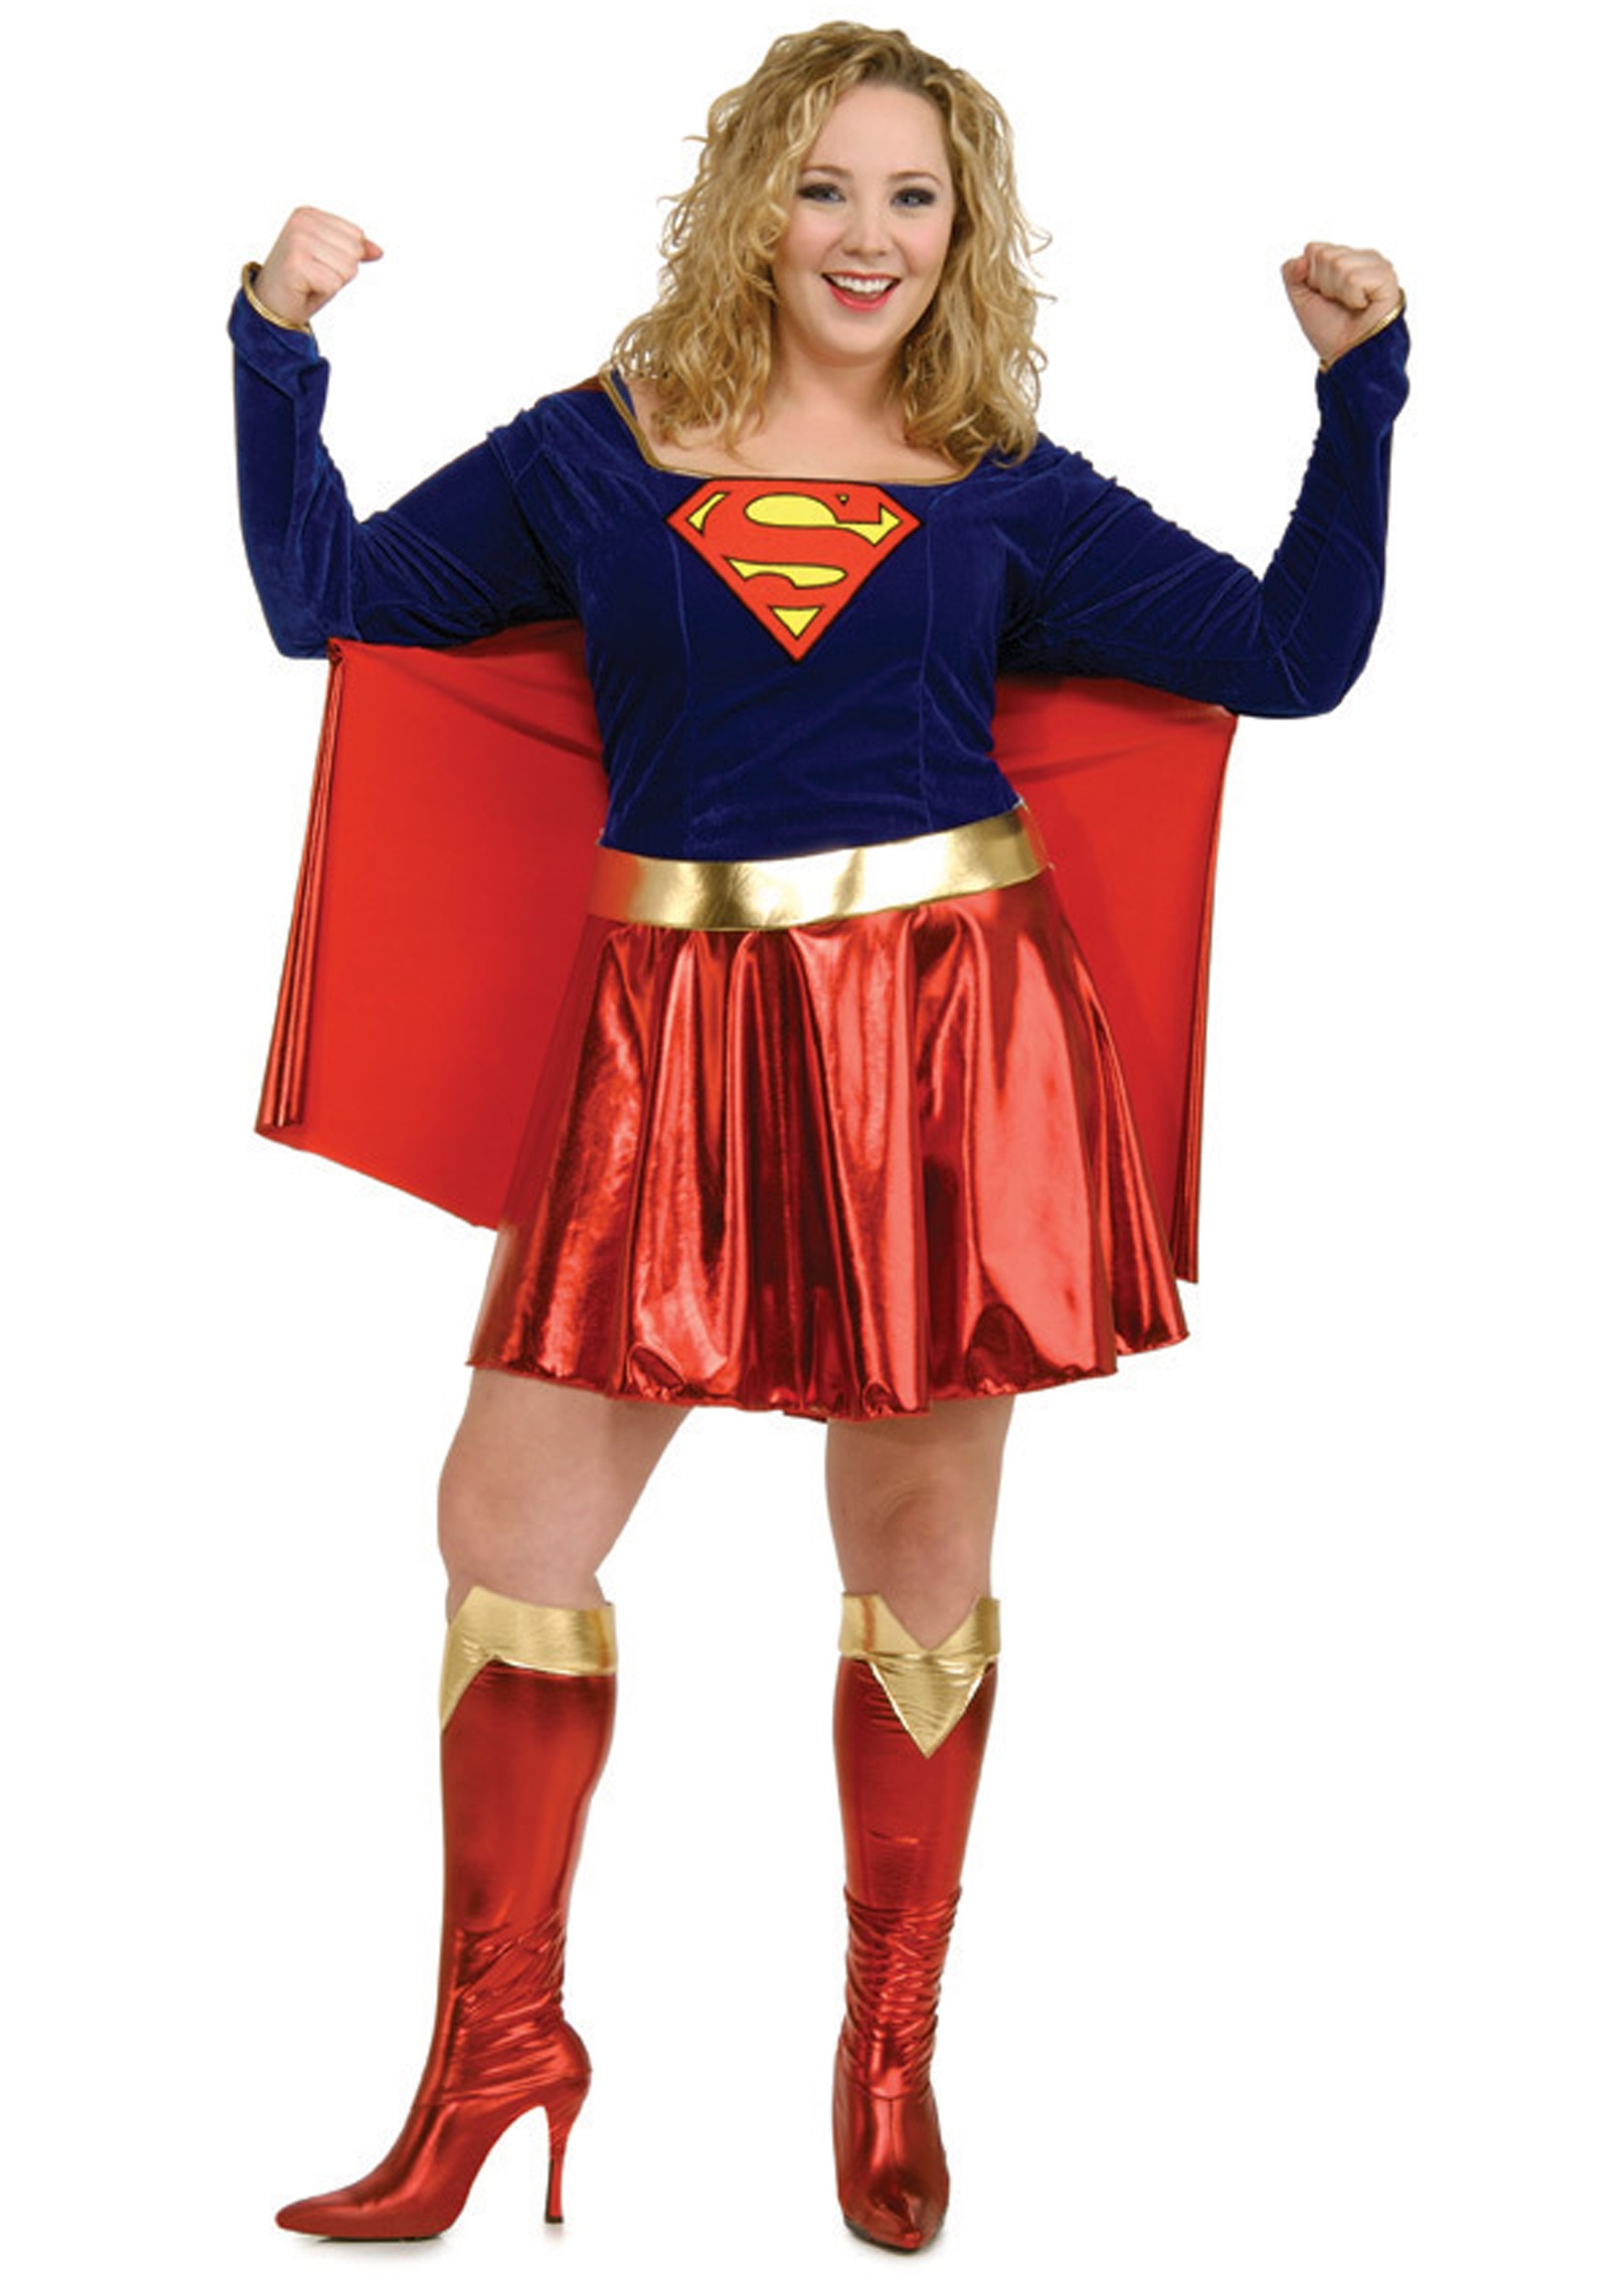 Women's Plus Size Supergirl Costume RU17479